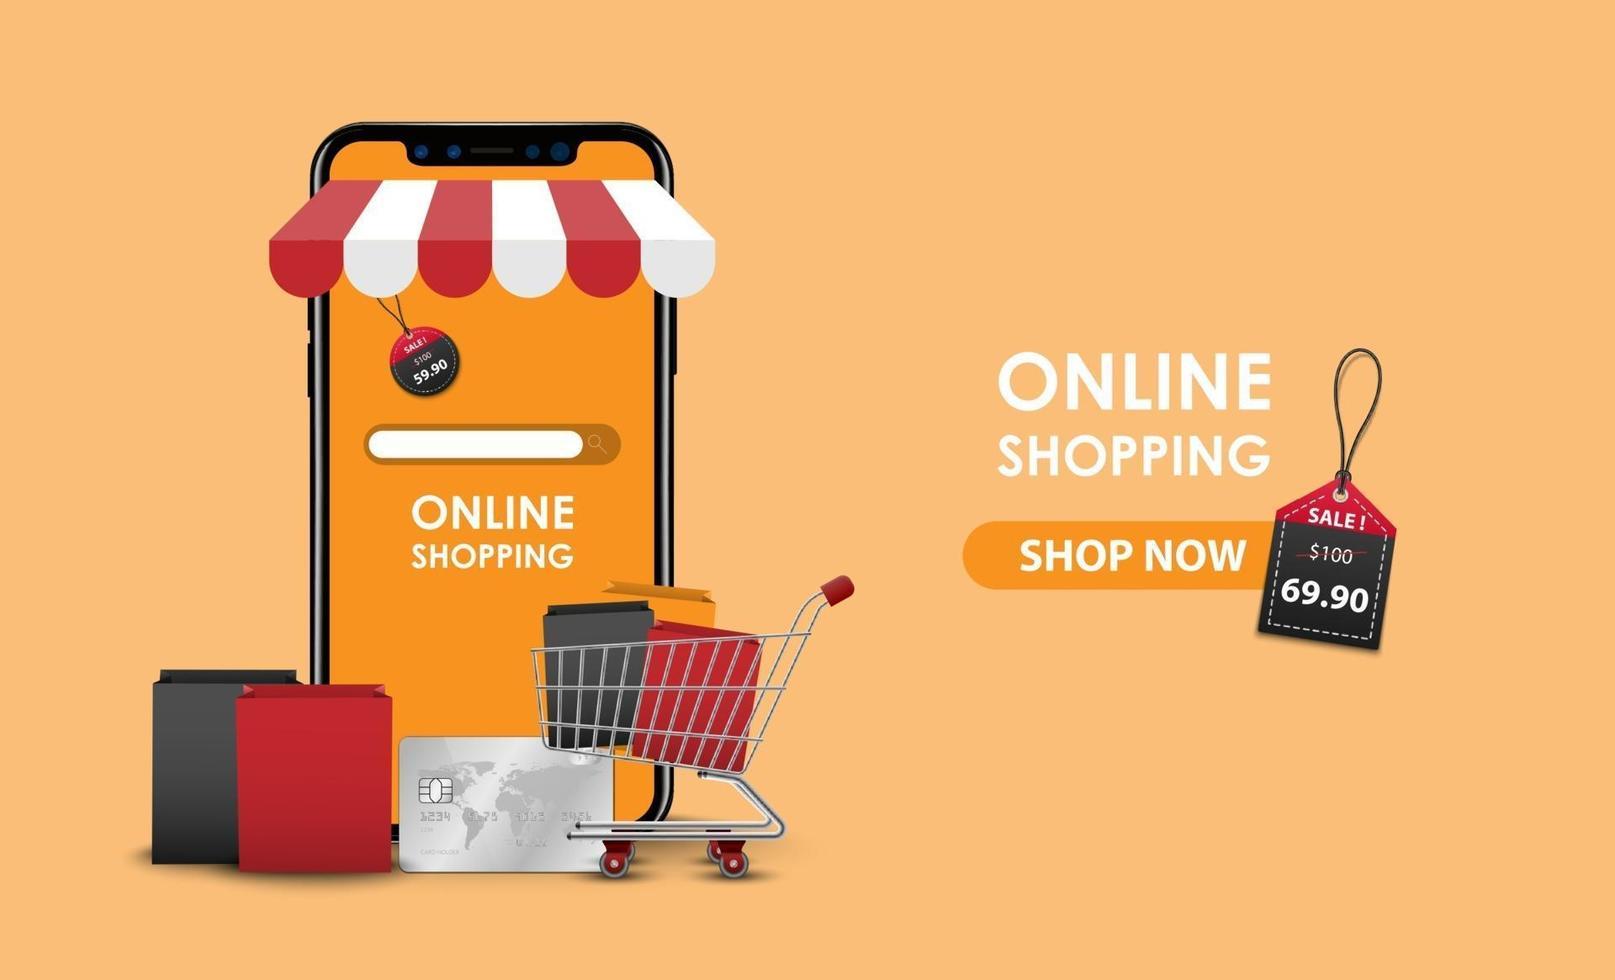 Online shopping concept, smartphone online store, vector illustration  1990015 Vector Art at Vecteezy